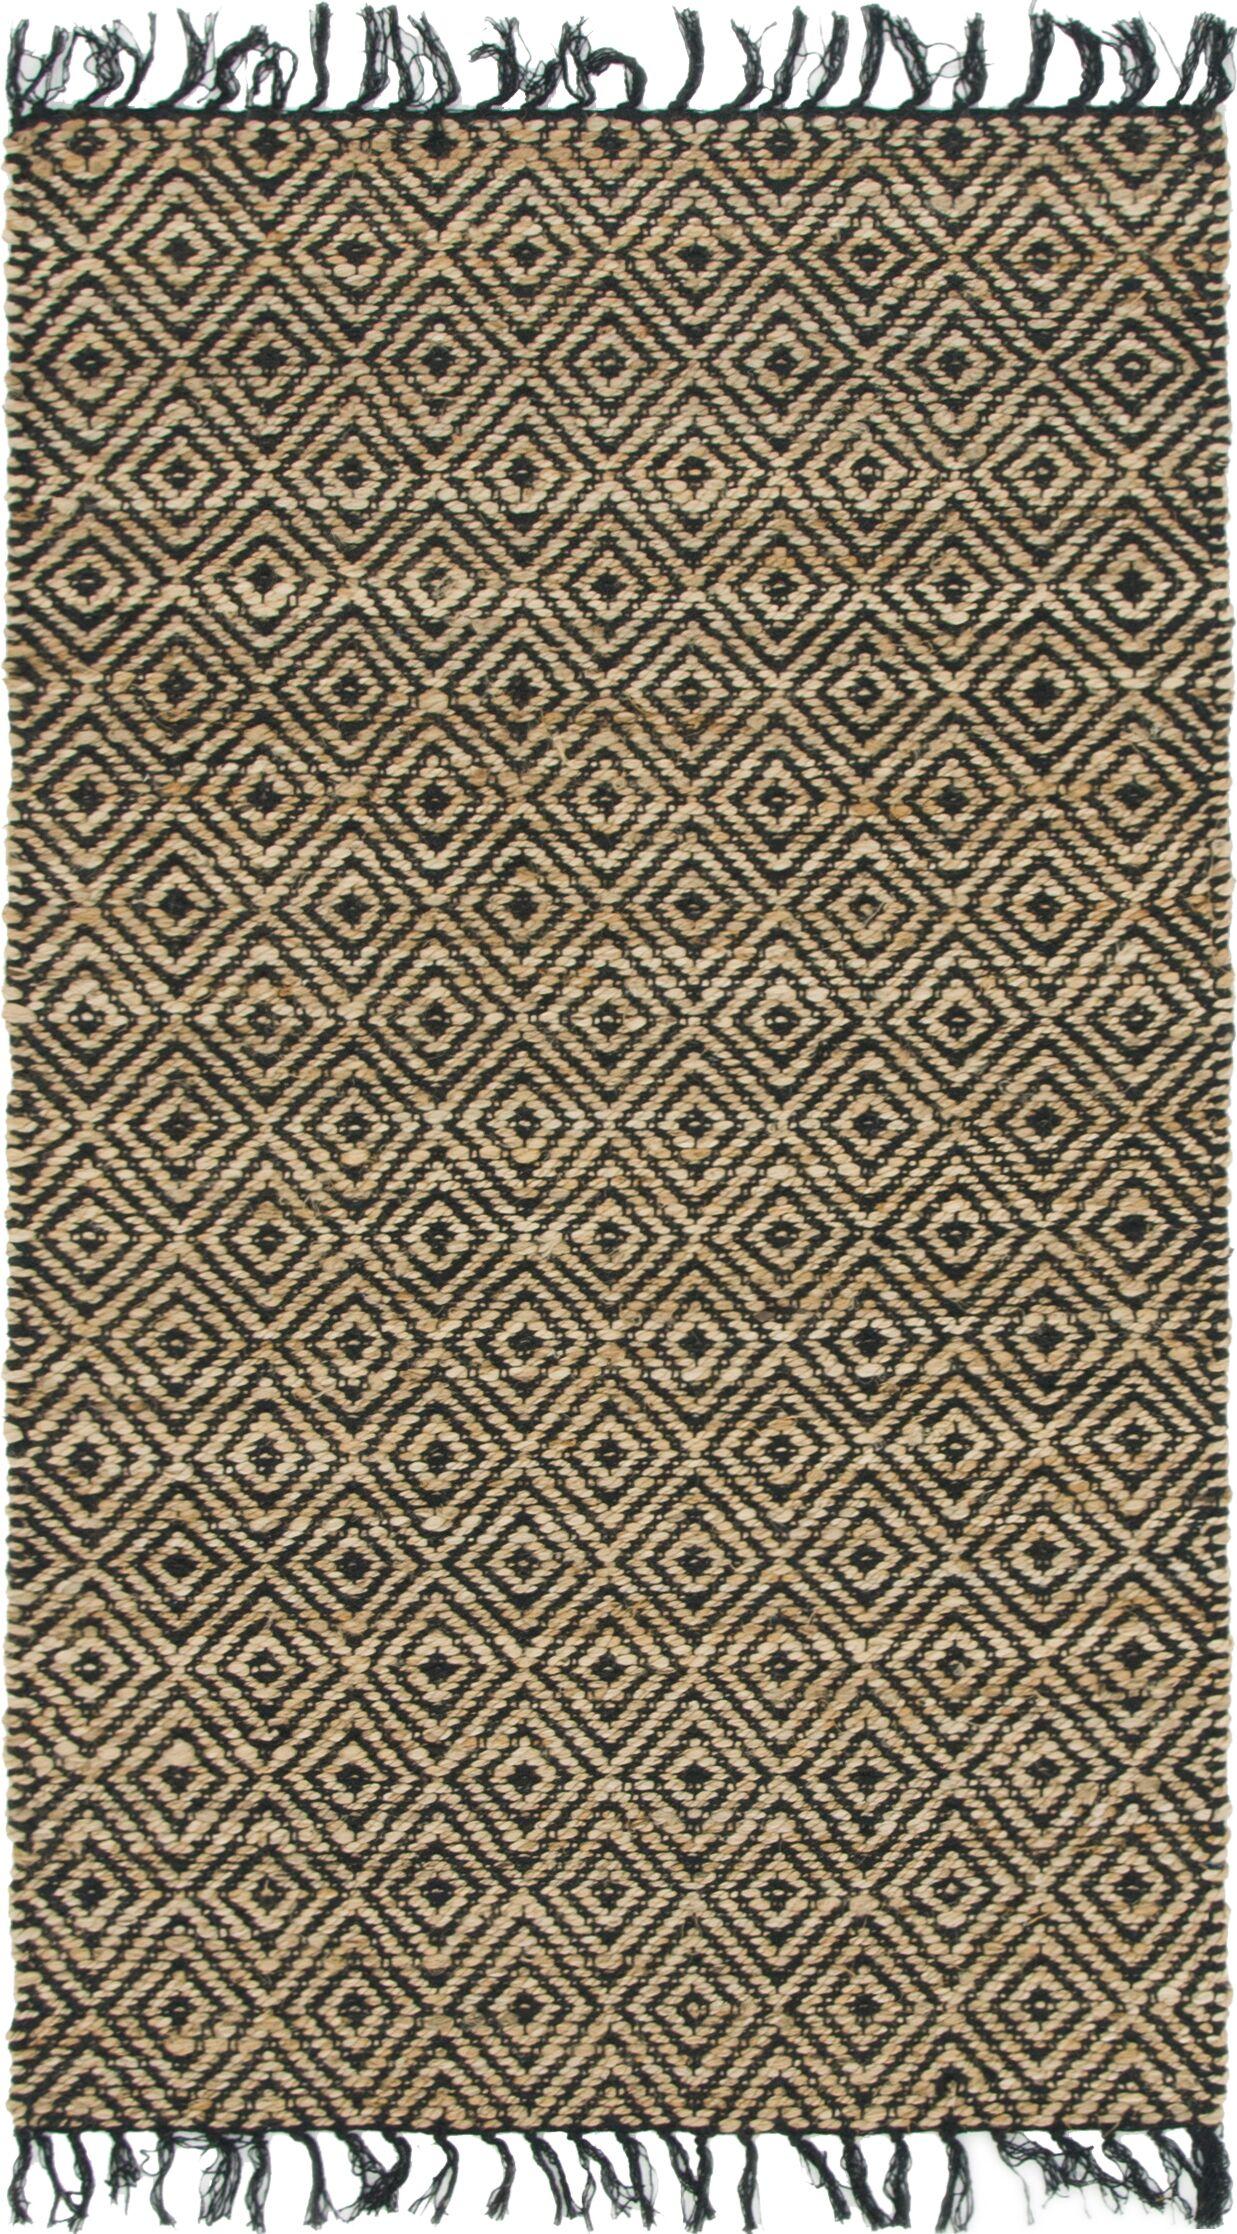 Mcelhaney Hand-Woven Beige/Black Area Rug Rug Size: Rectangle 3'3